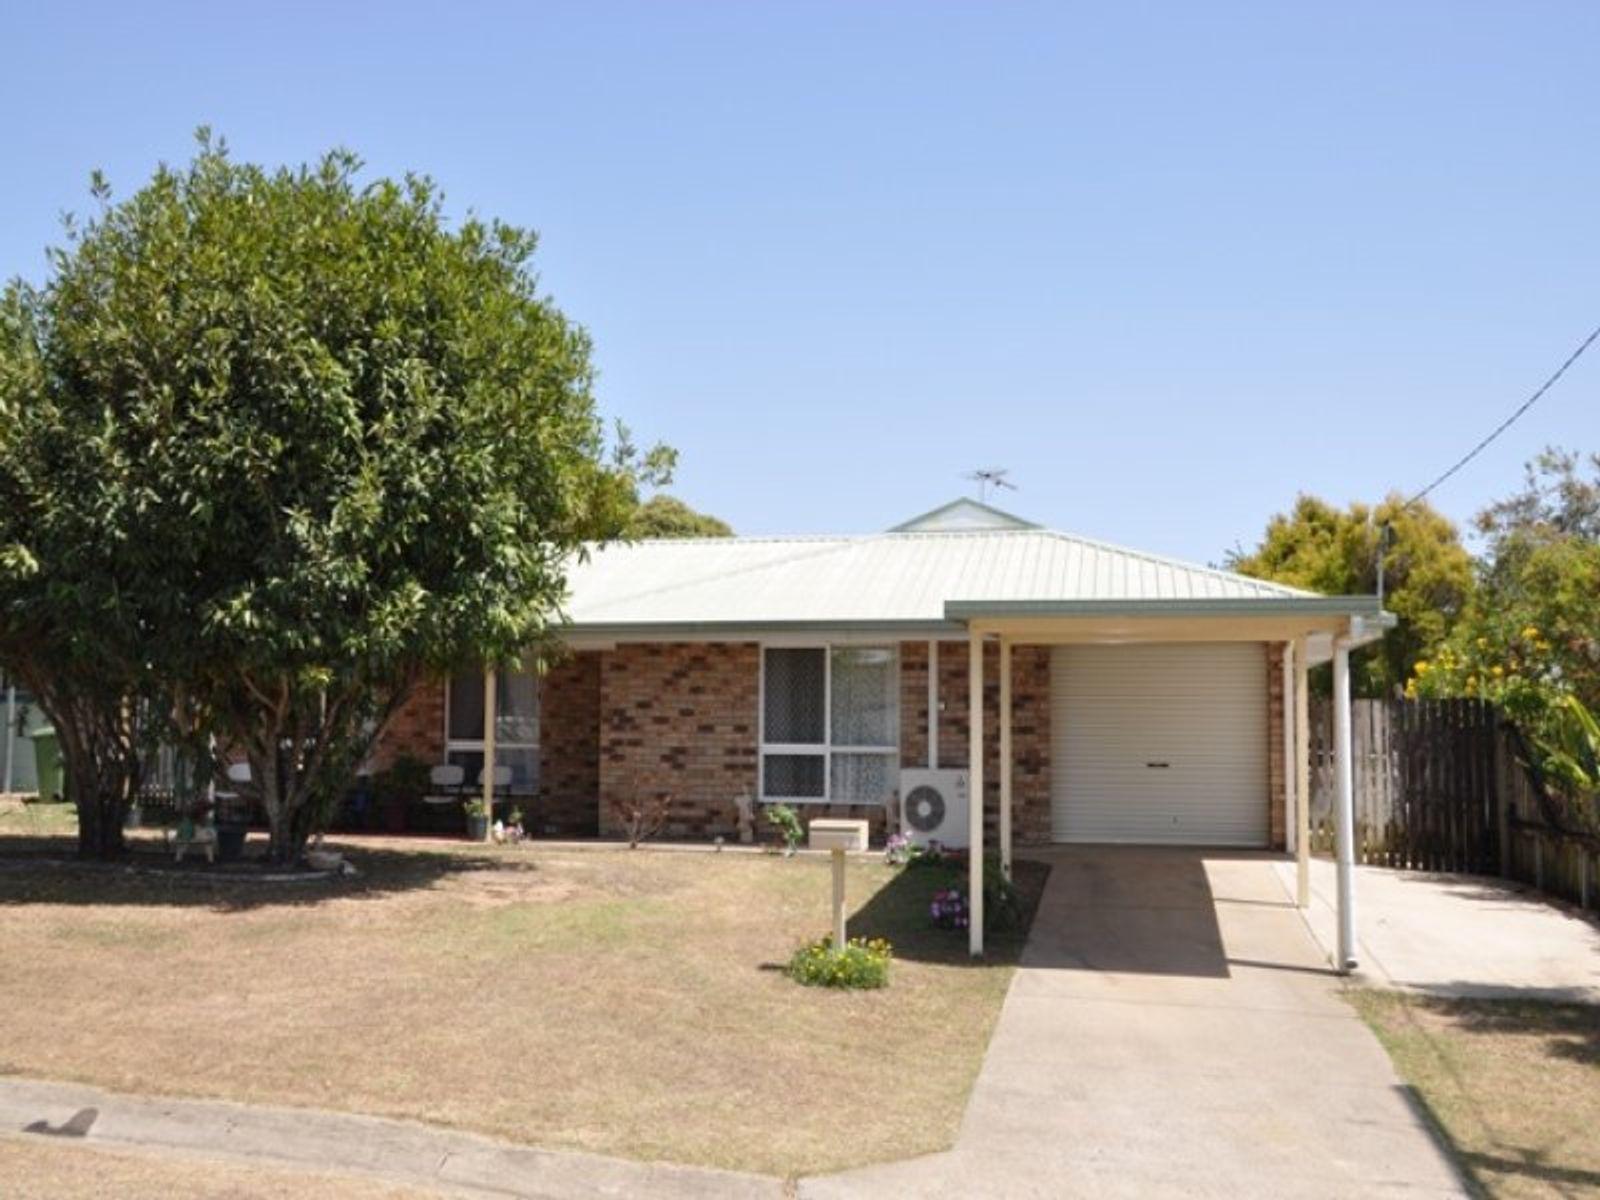 15 Lilliendal Ave, Sarina, QLD 4737